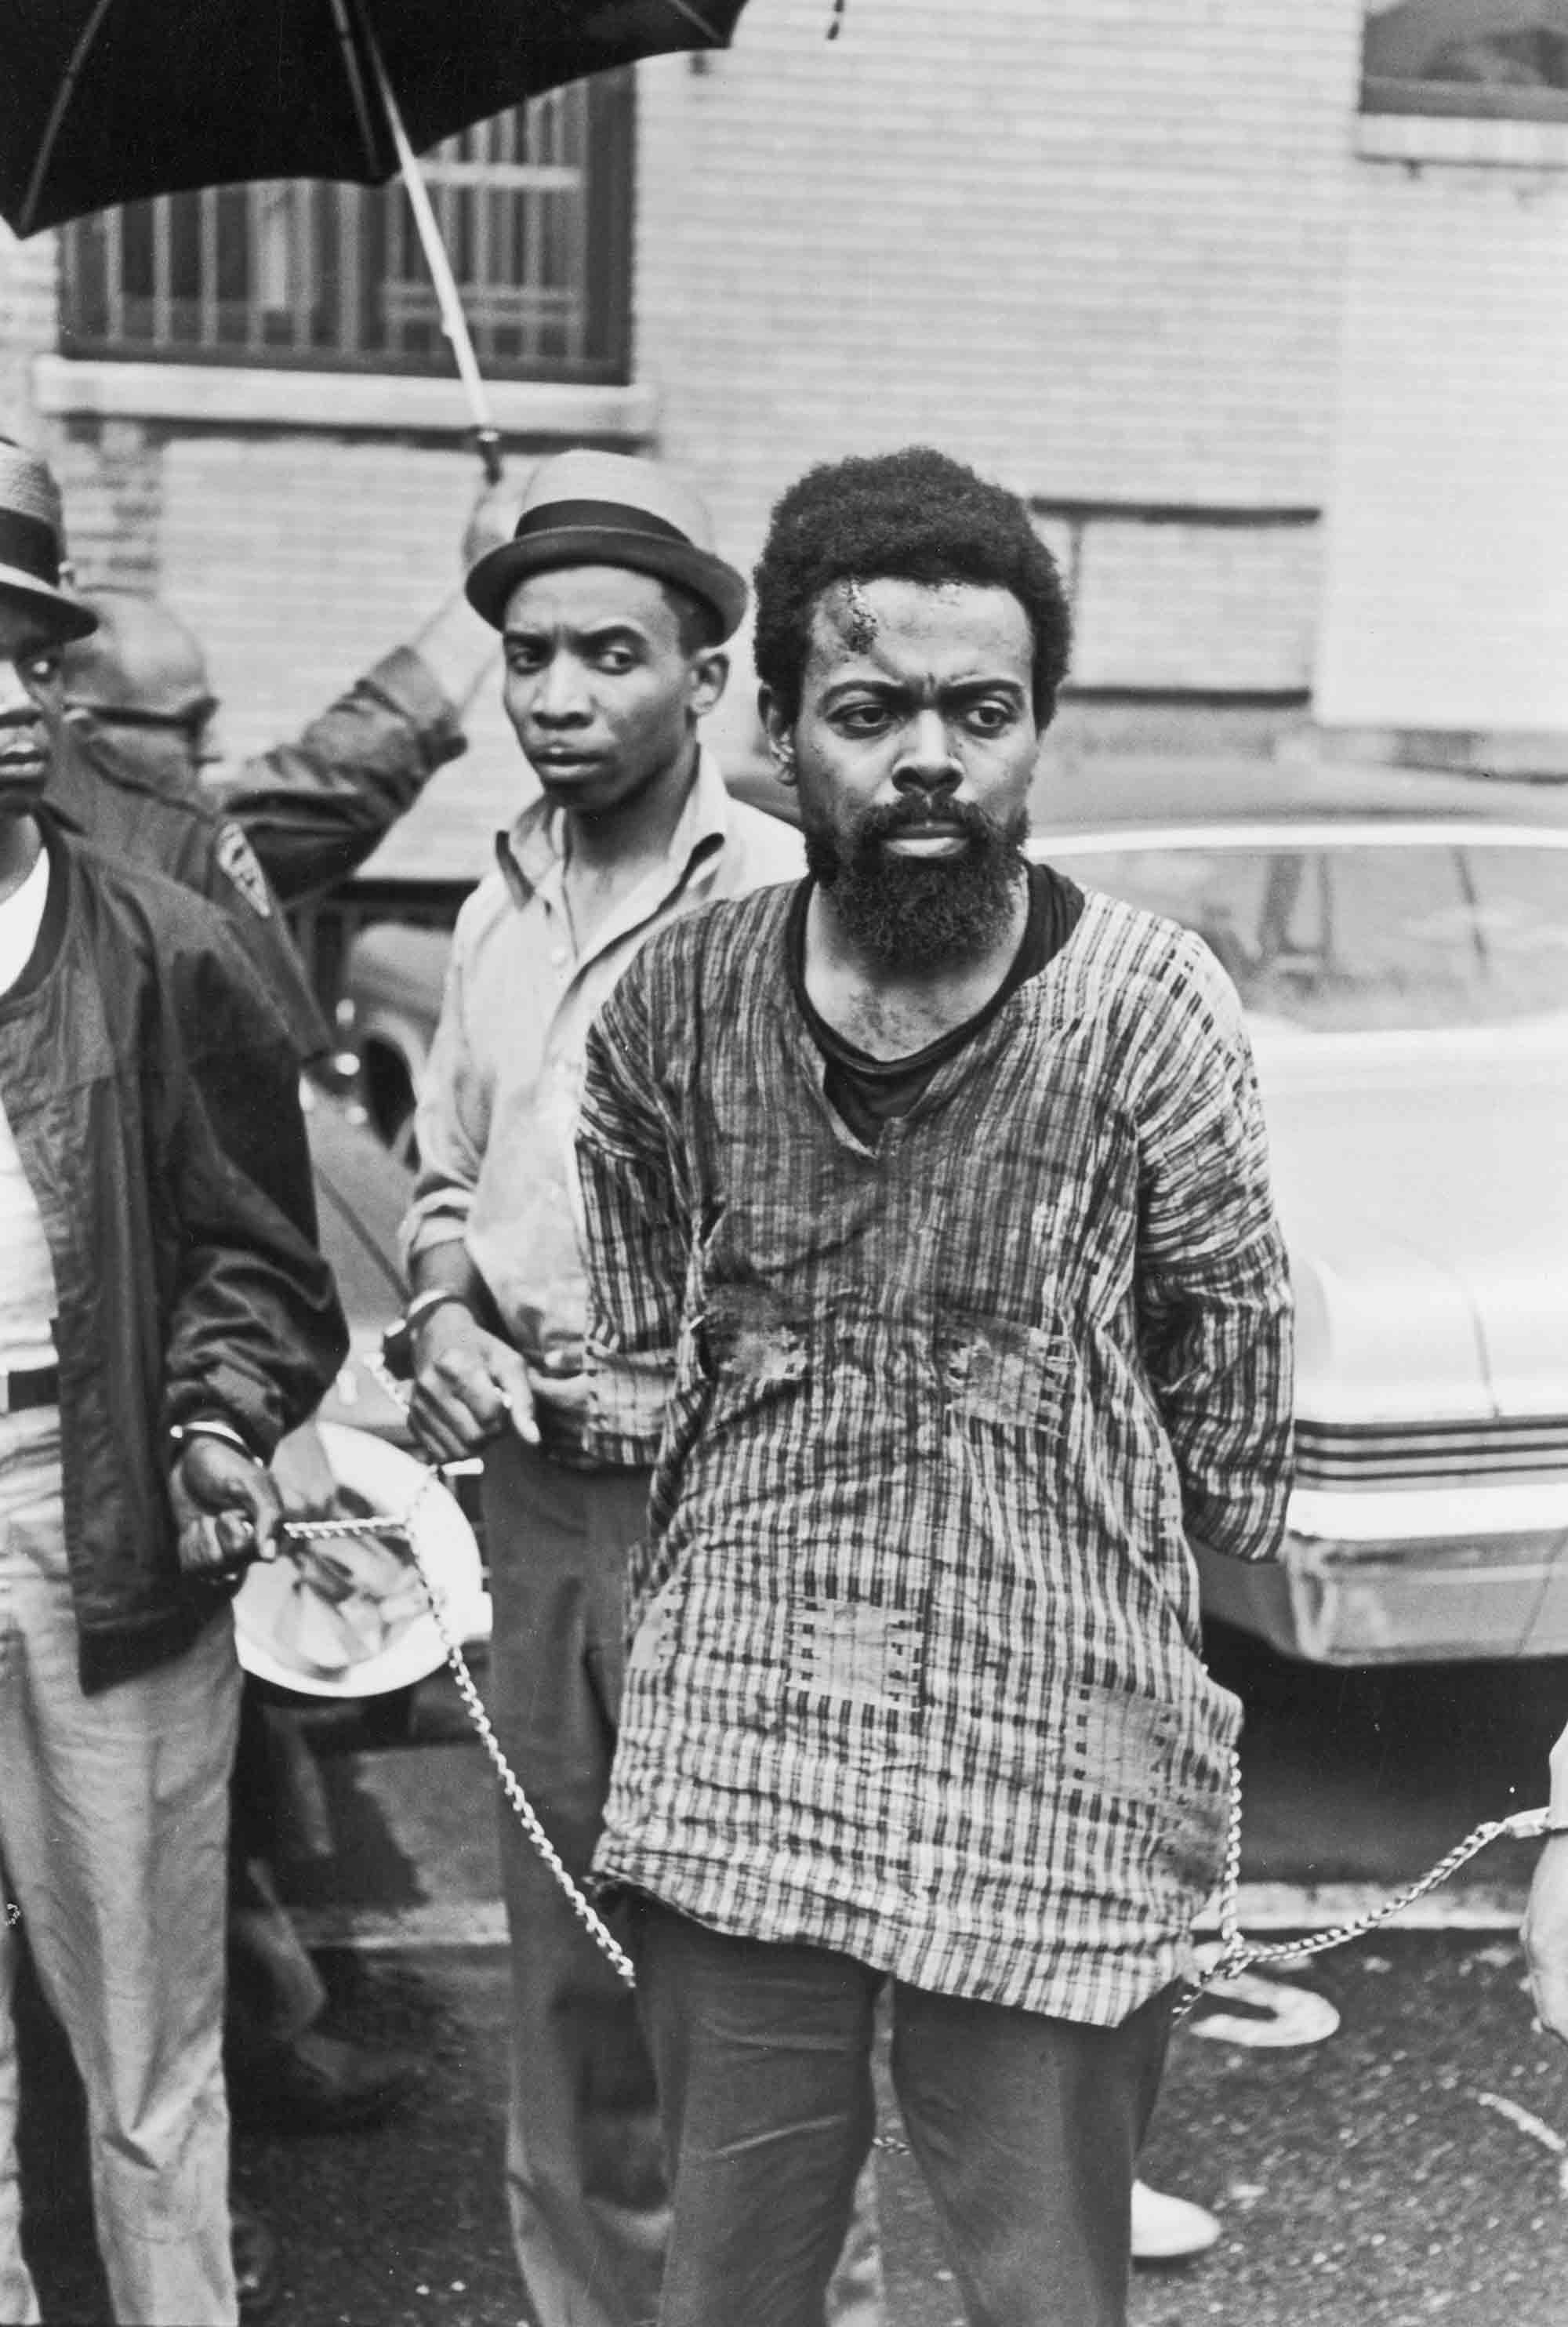 Amiri Baraka (formerly LeRoi Jones) arrested during the Newark Riots in Newark, NJ, July 14, 1967